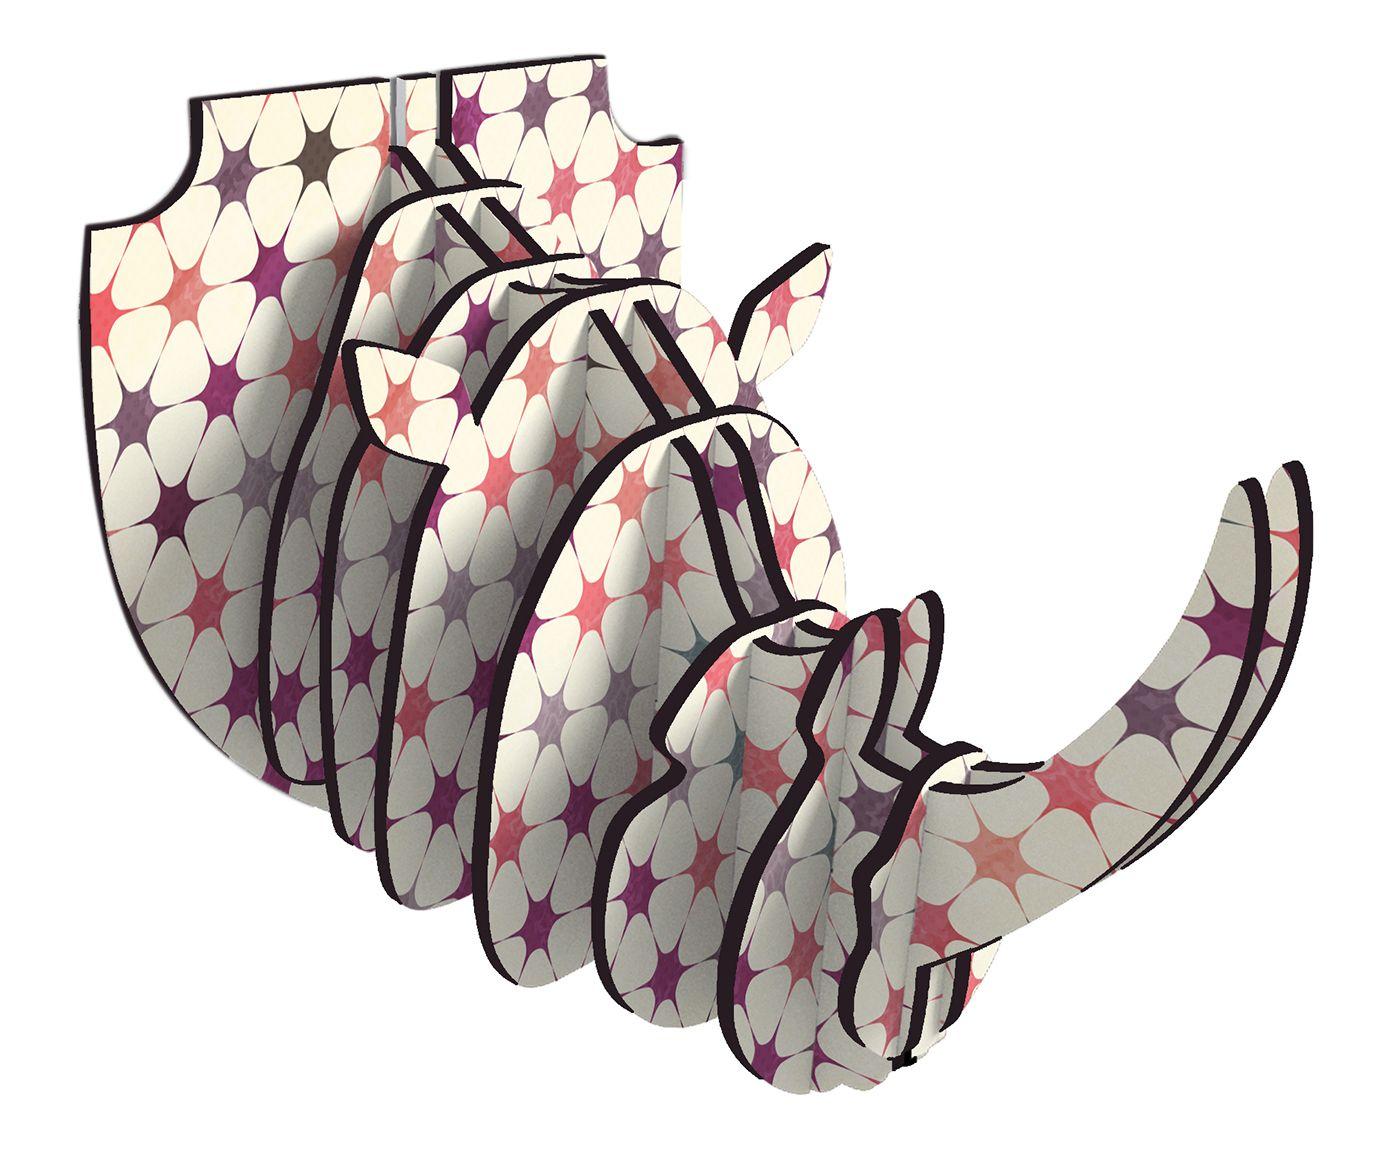 Adorno de Parede Rhino Ivy | Westwing.com.br